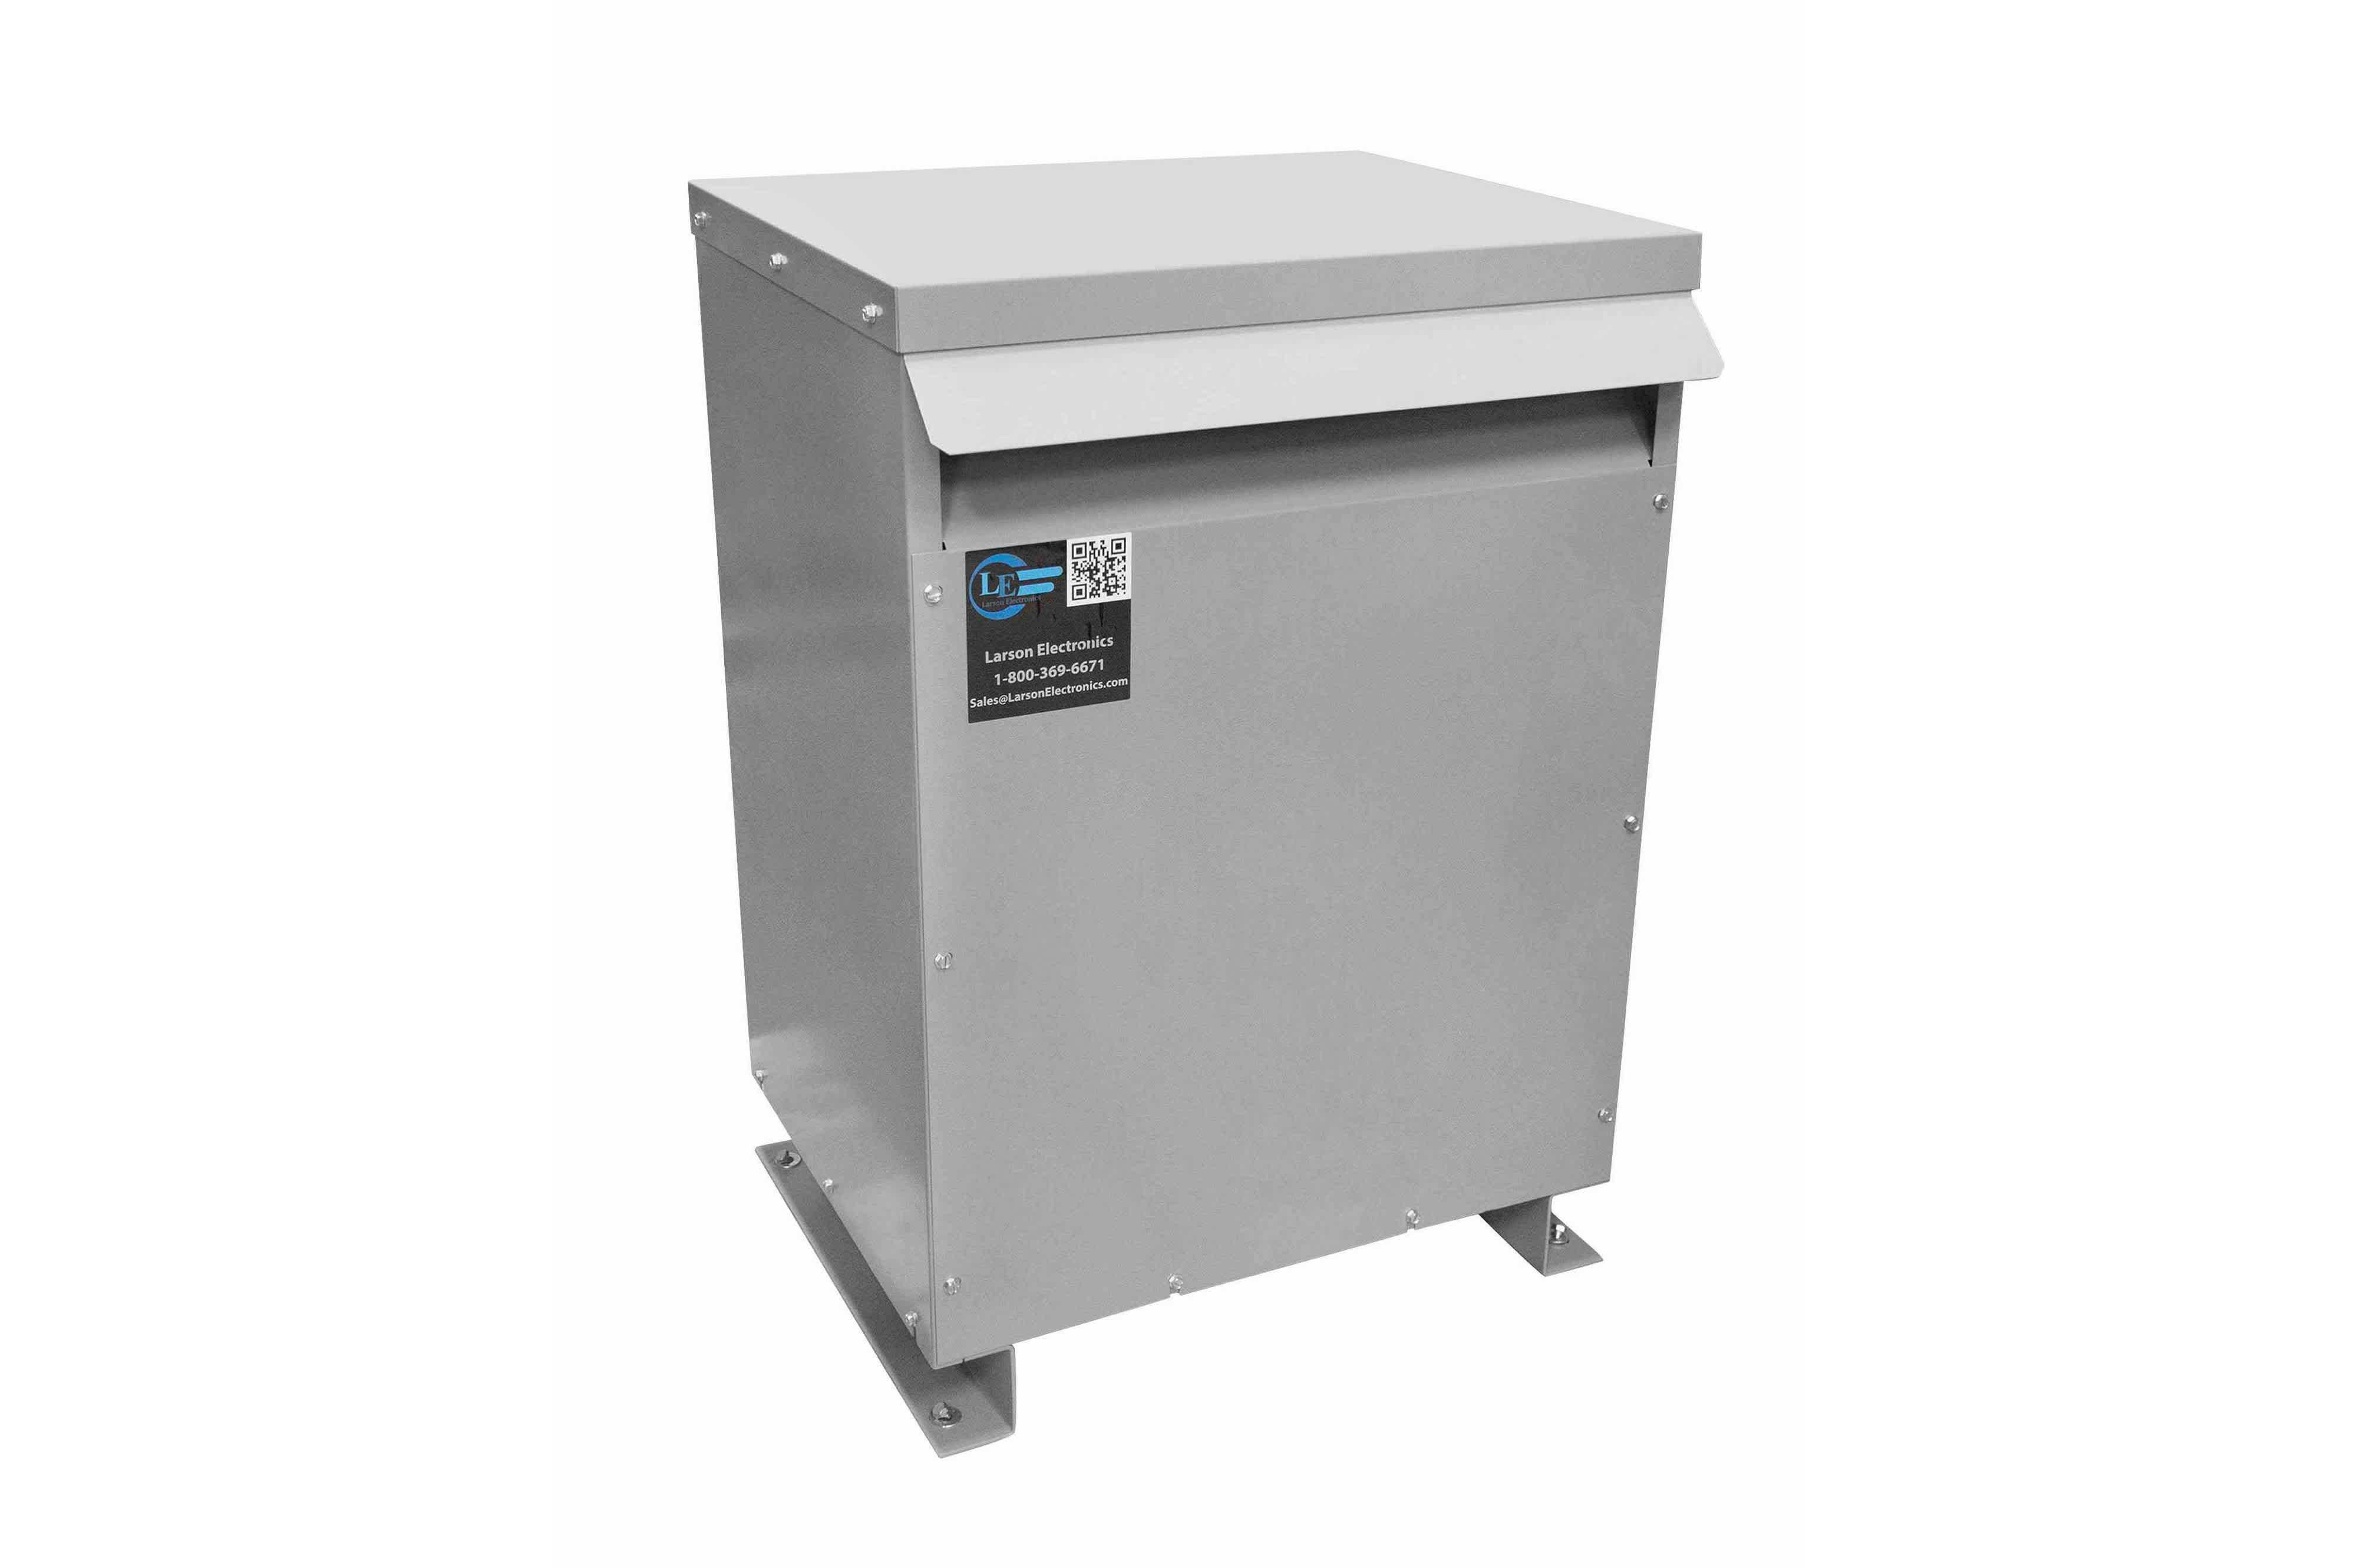 137.5 kVA 3PH Isolation Transformer, 230V Wye Primary, 208V Delta Secondary, N3R, Ventilated, 60 Hz